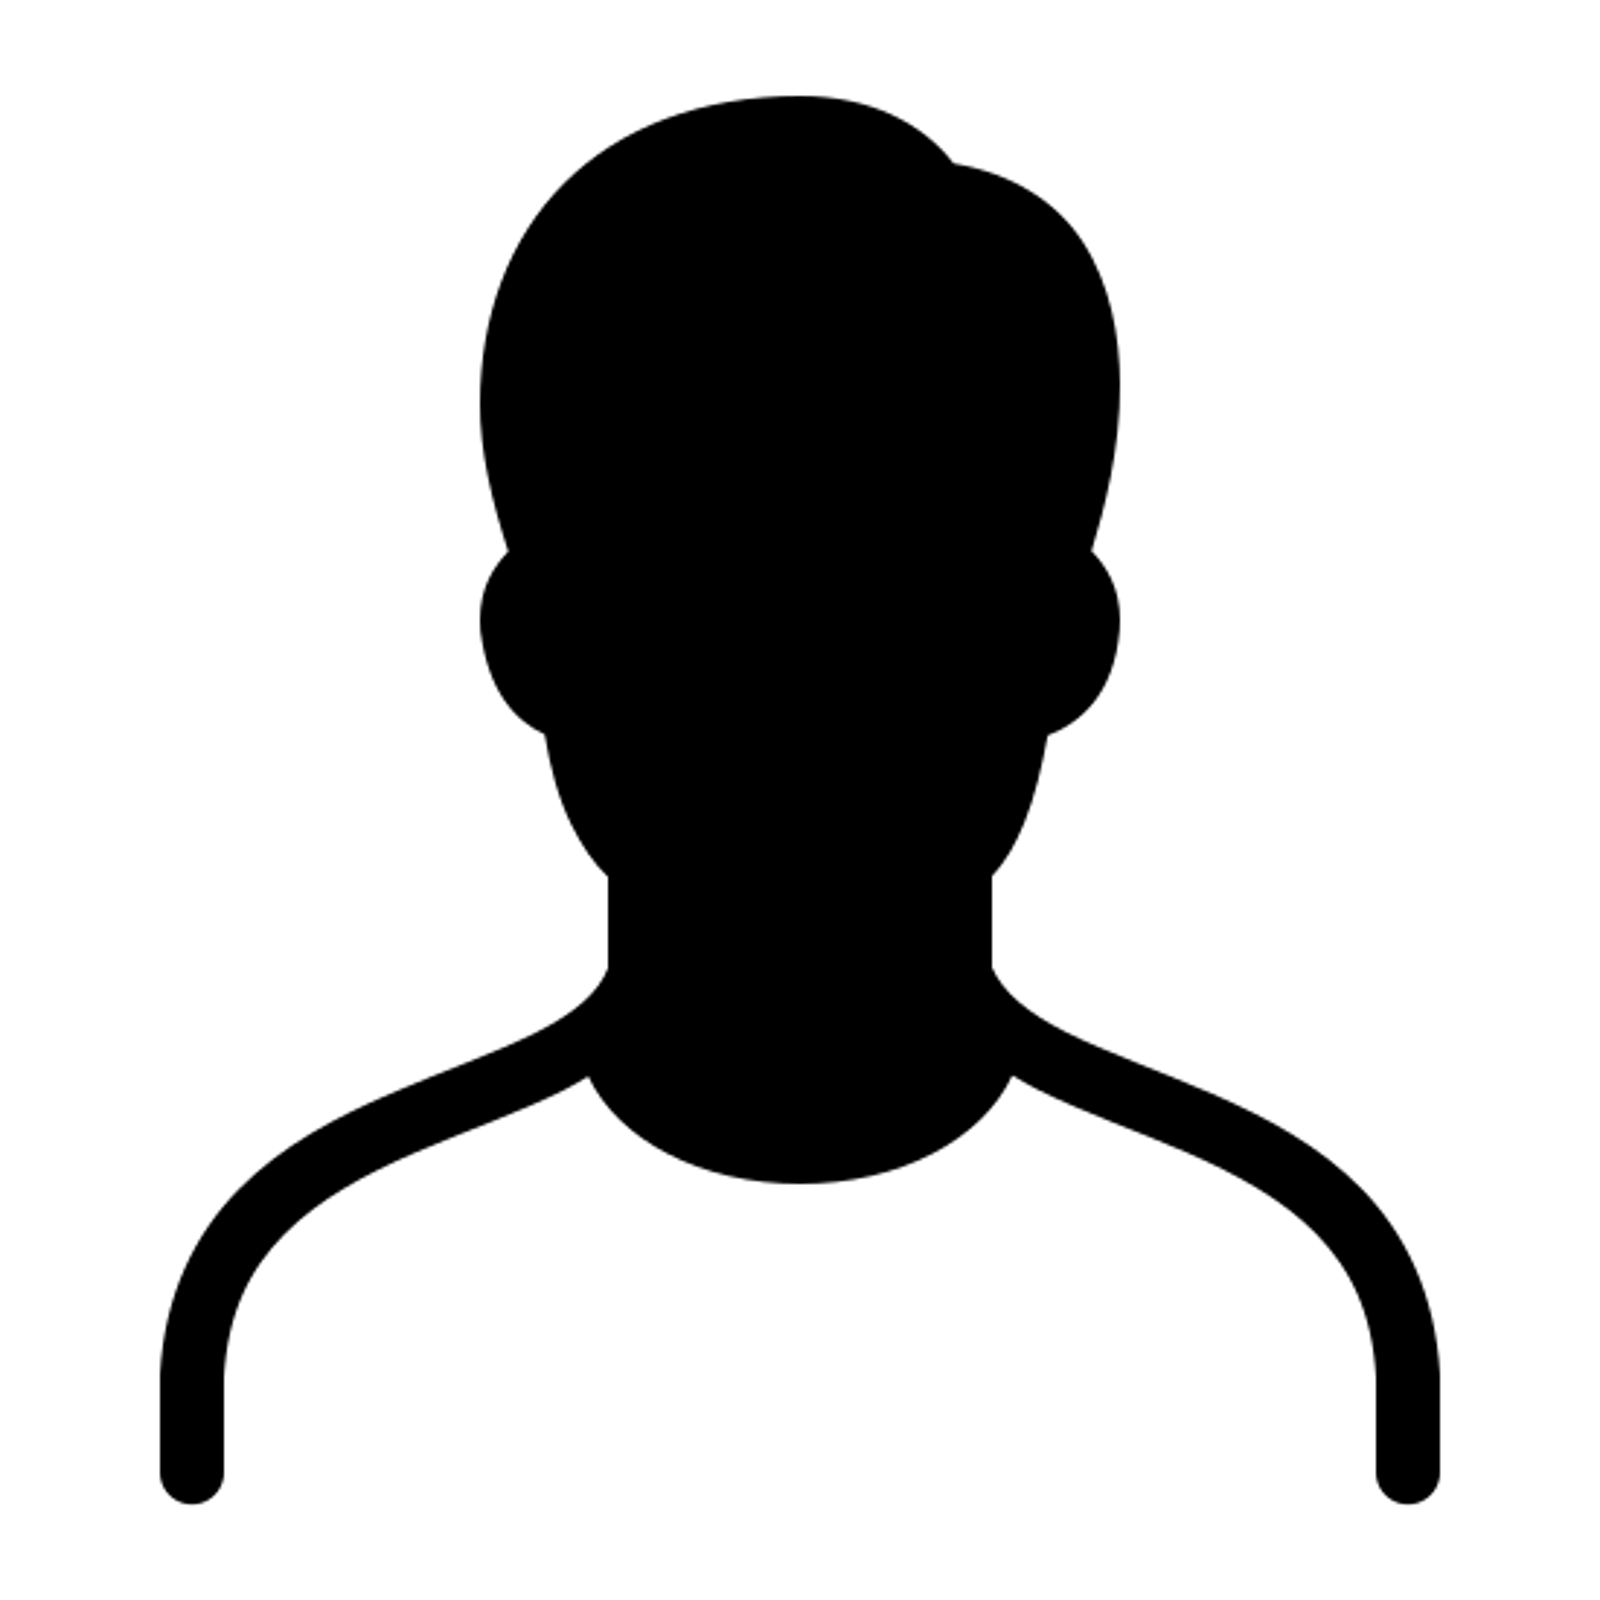 Head Massage Area Filled icon